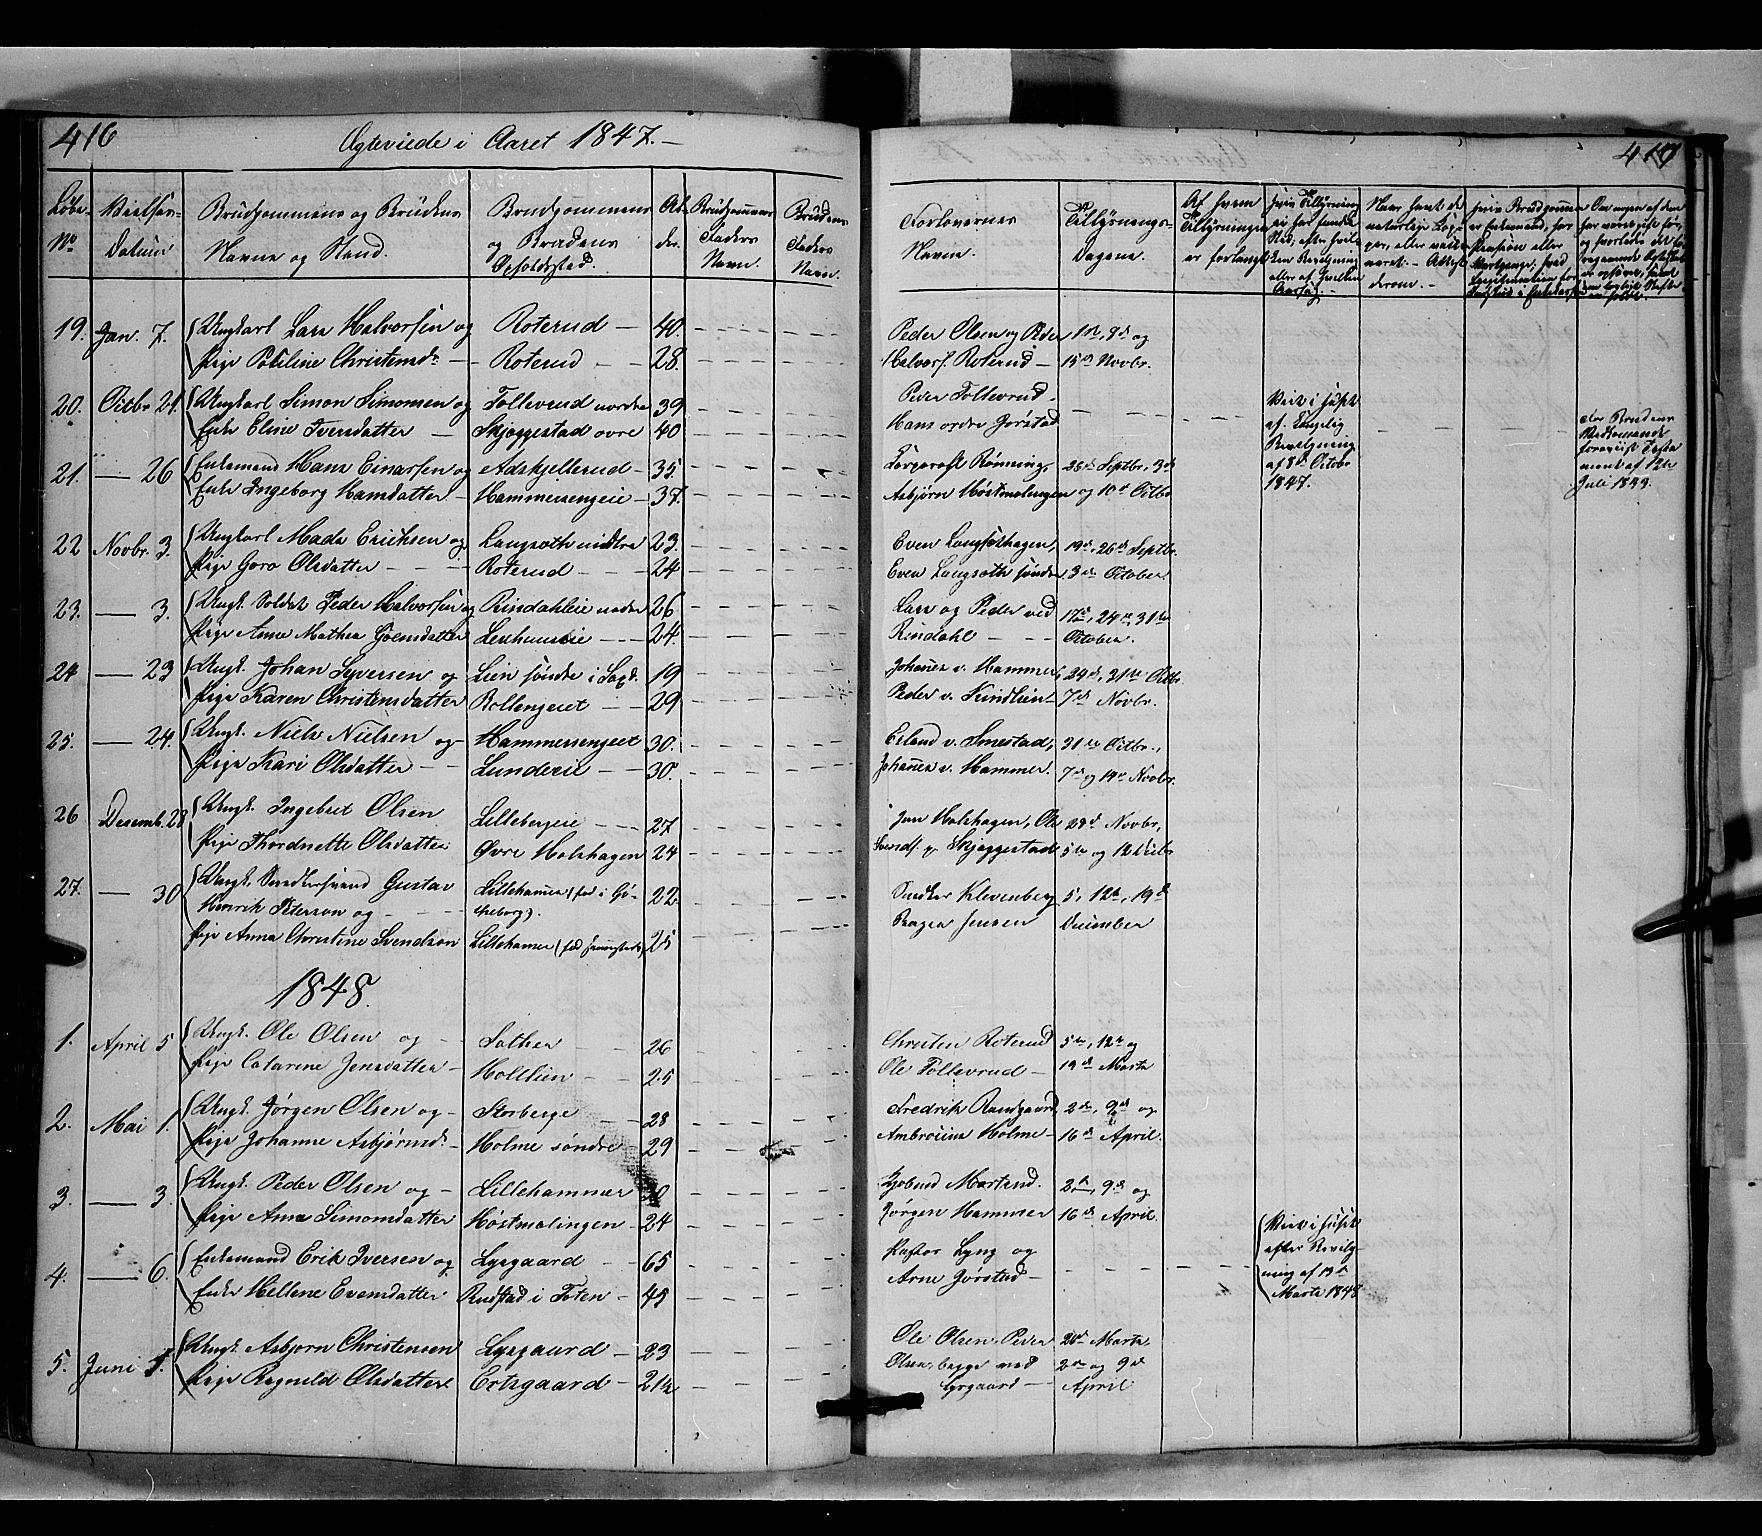 SAH, Fåberg prestekontor, Klokkerbok nr. 6, 1837-1855, s. 416-417